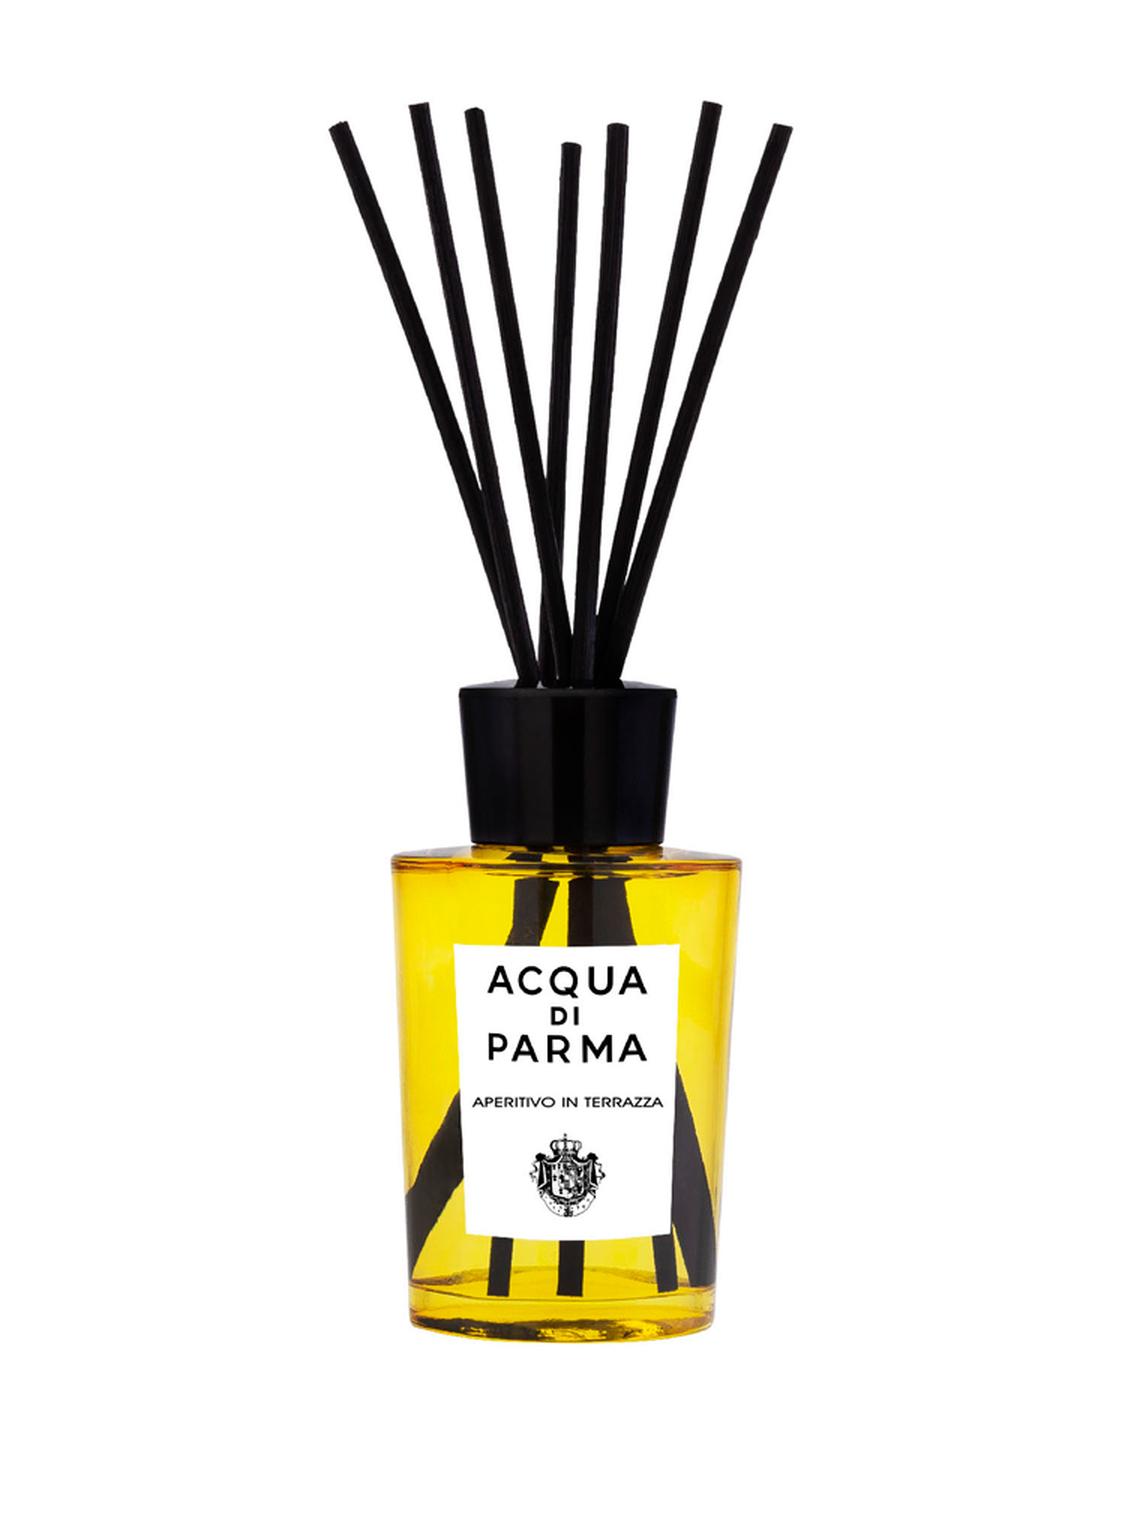 Image of Acqua Di Parma Aperitivo In Terrazza Raumduft 180 ml